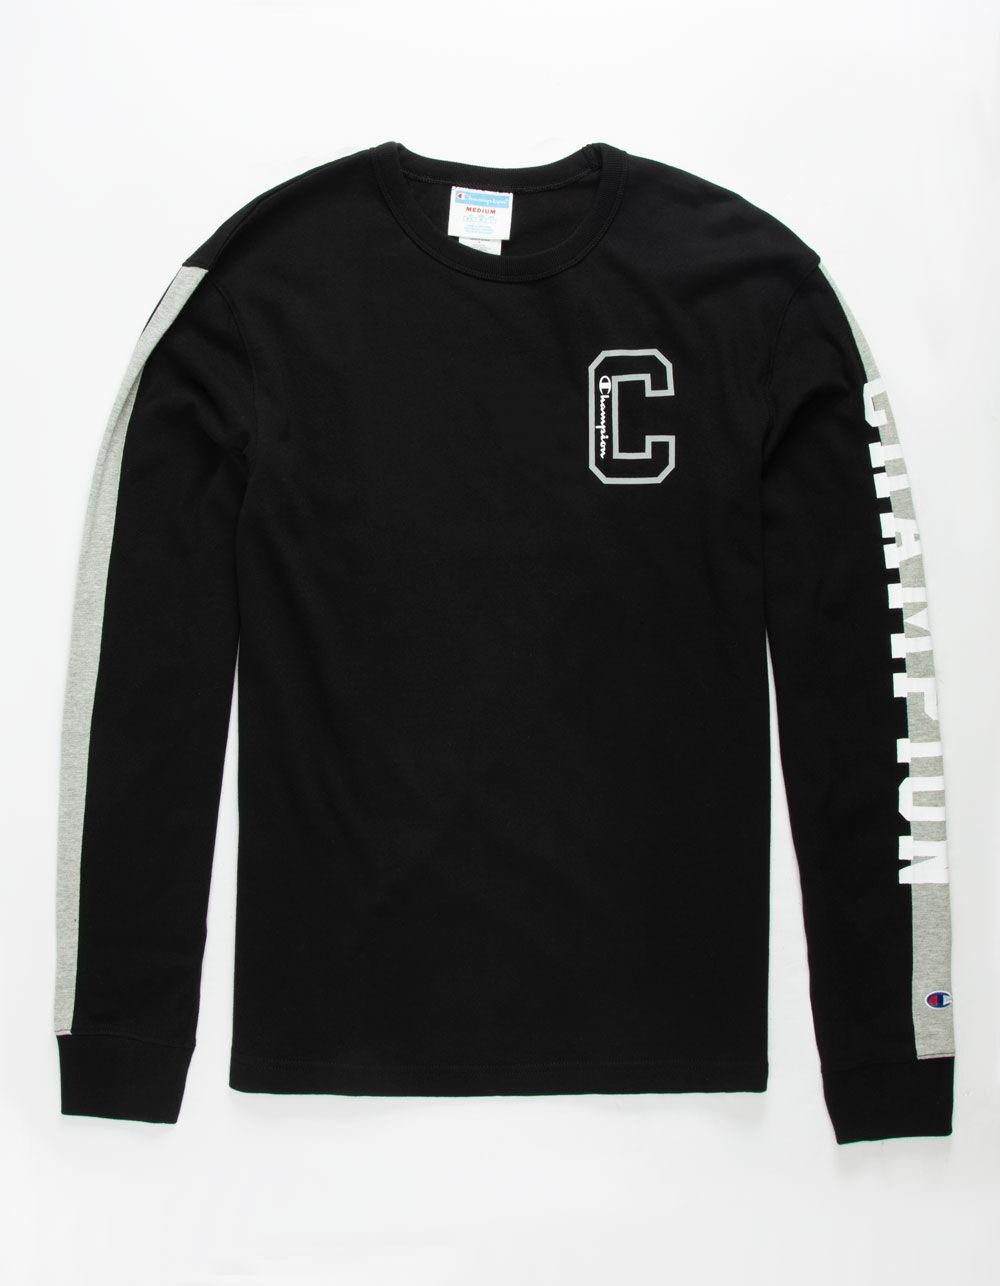 CHAMPION Block C Black T-Shirt